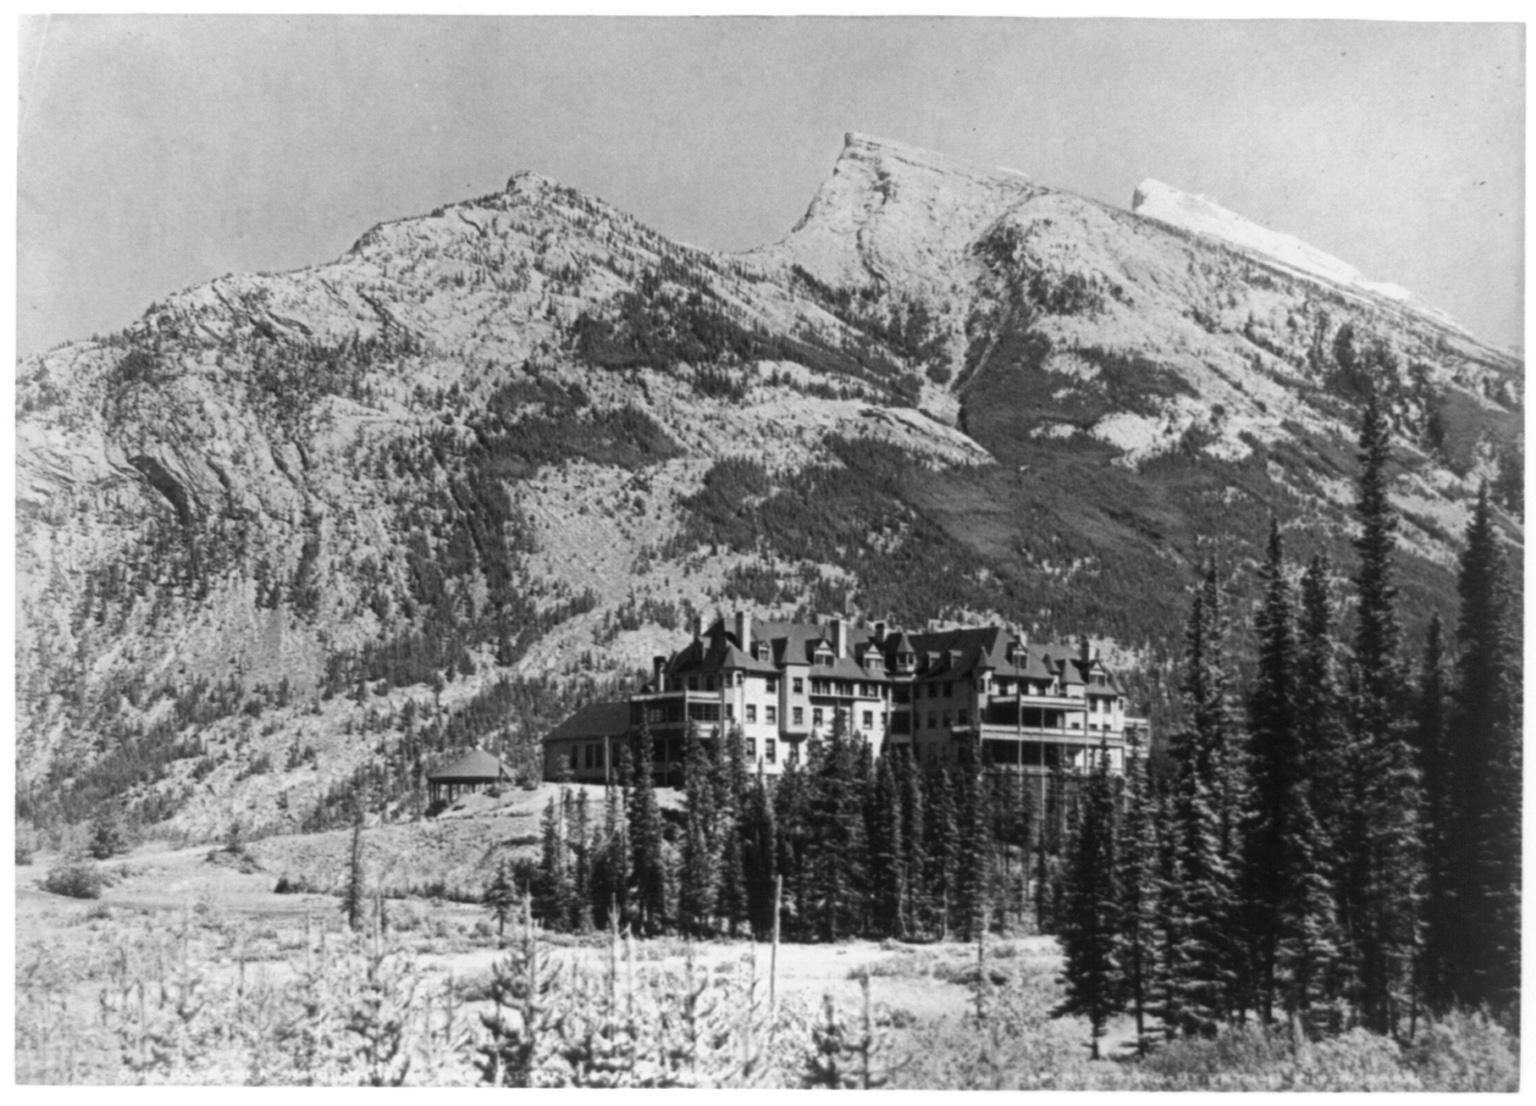 Banff Springs Hotel in 1902